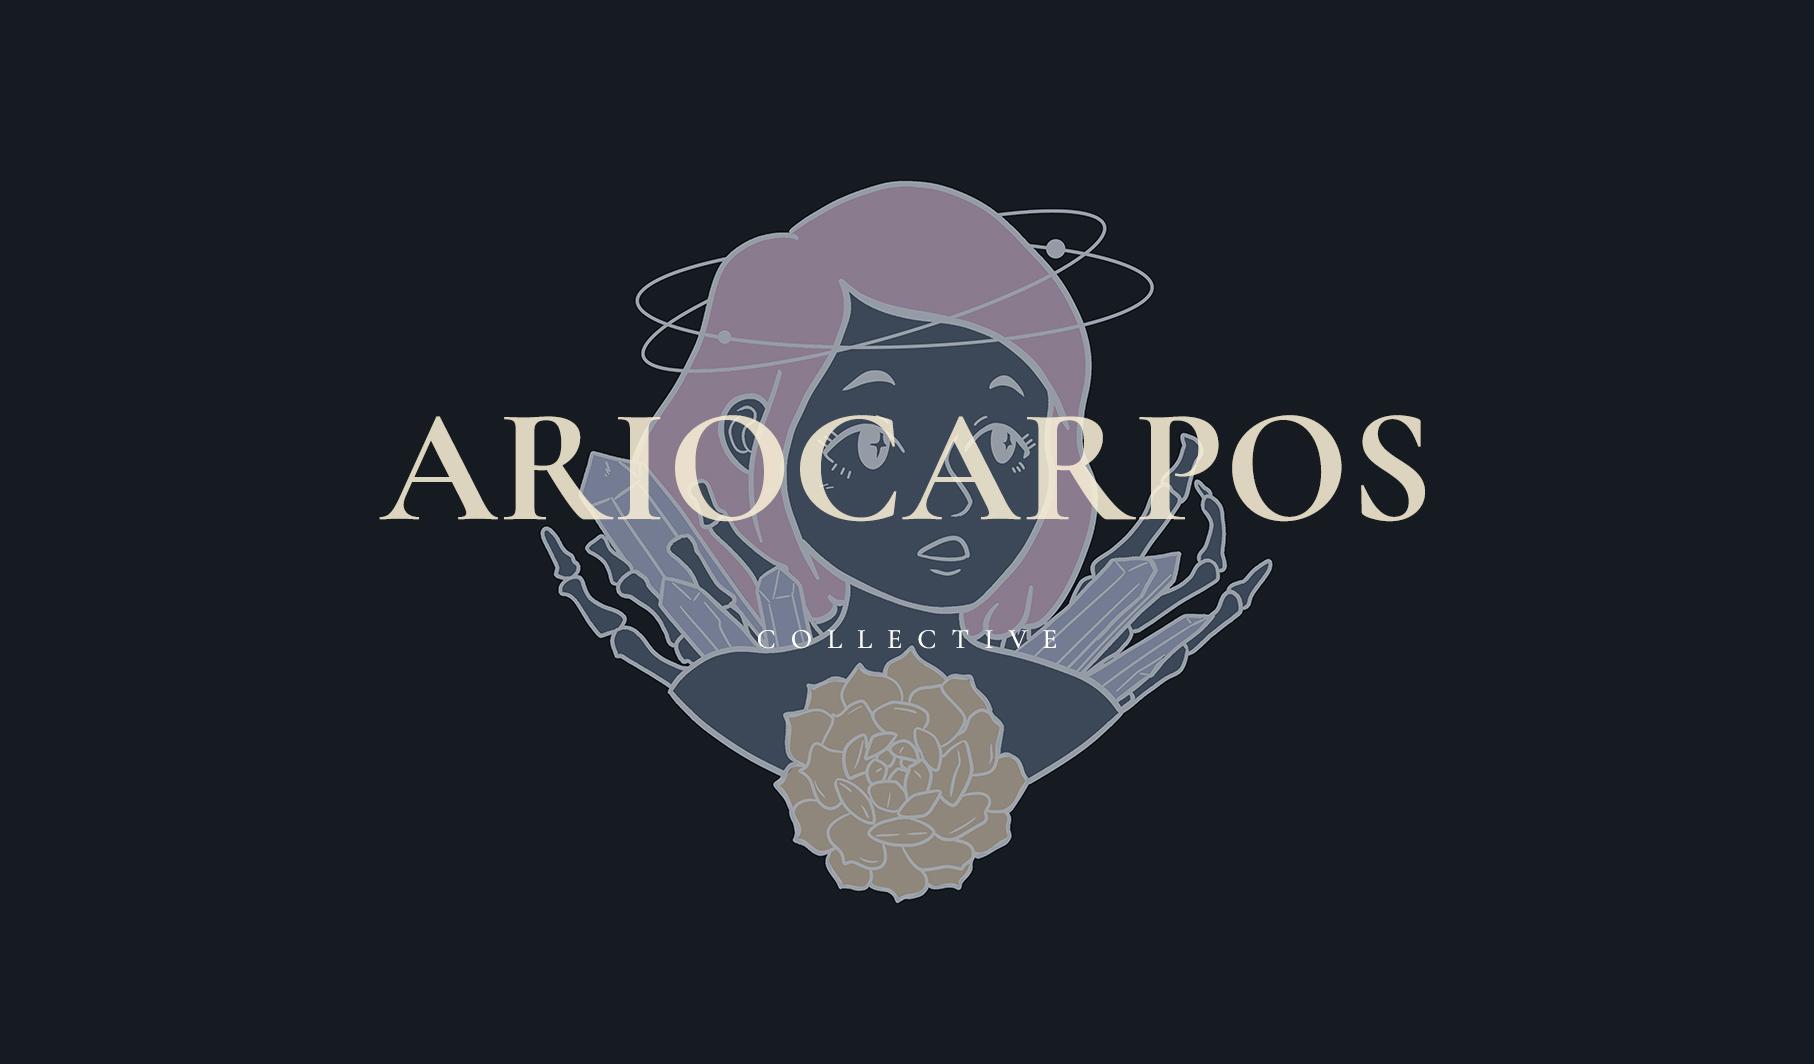 Ario business card2.jpg